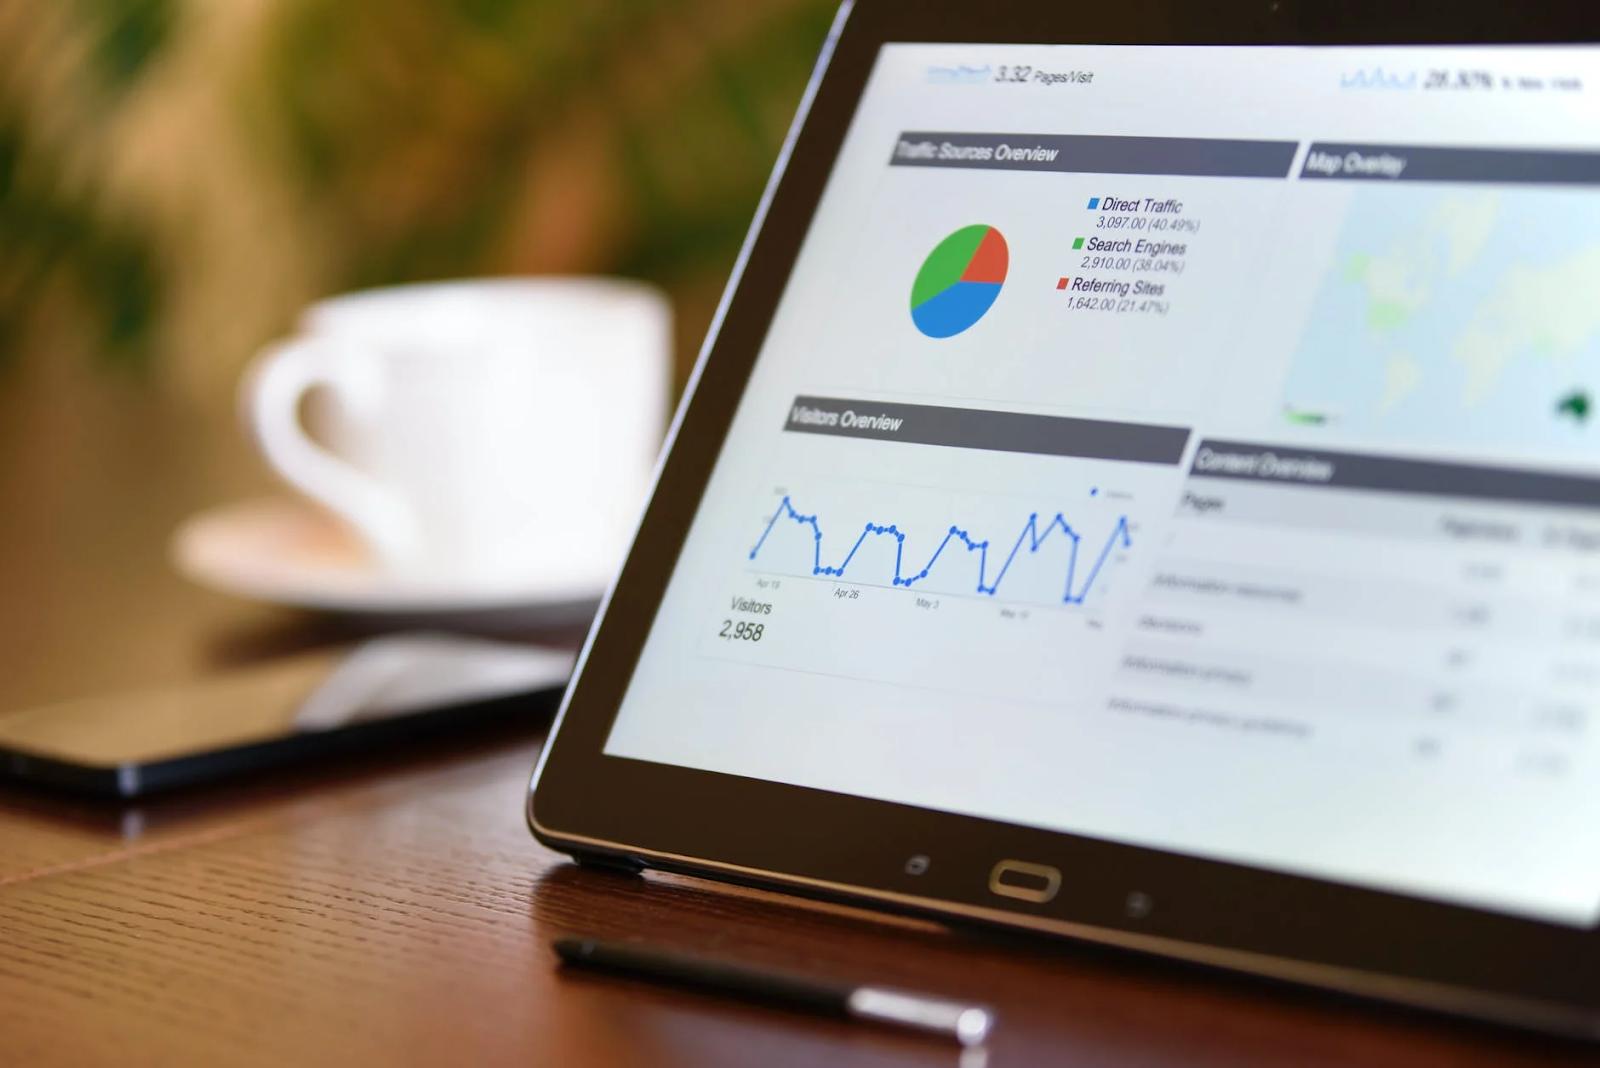 Tablet exibindo estatísticas -levantamento de requisitos de software